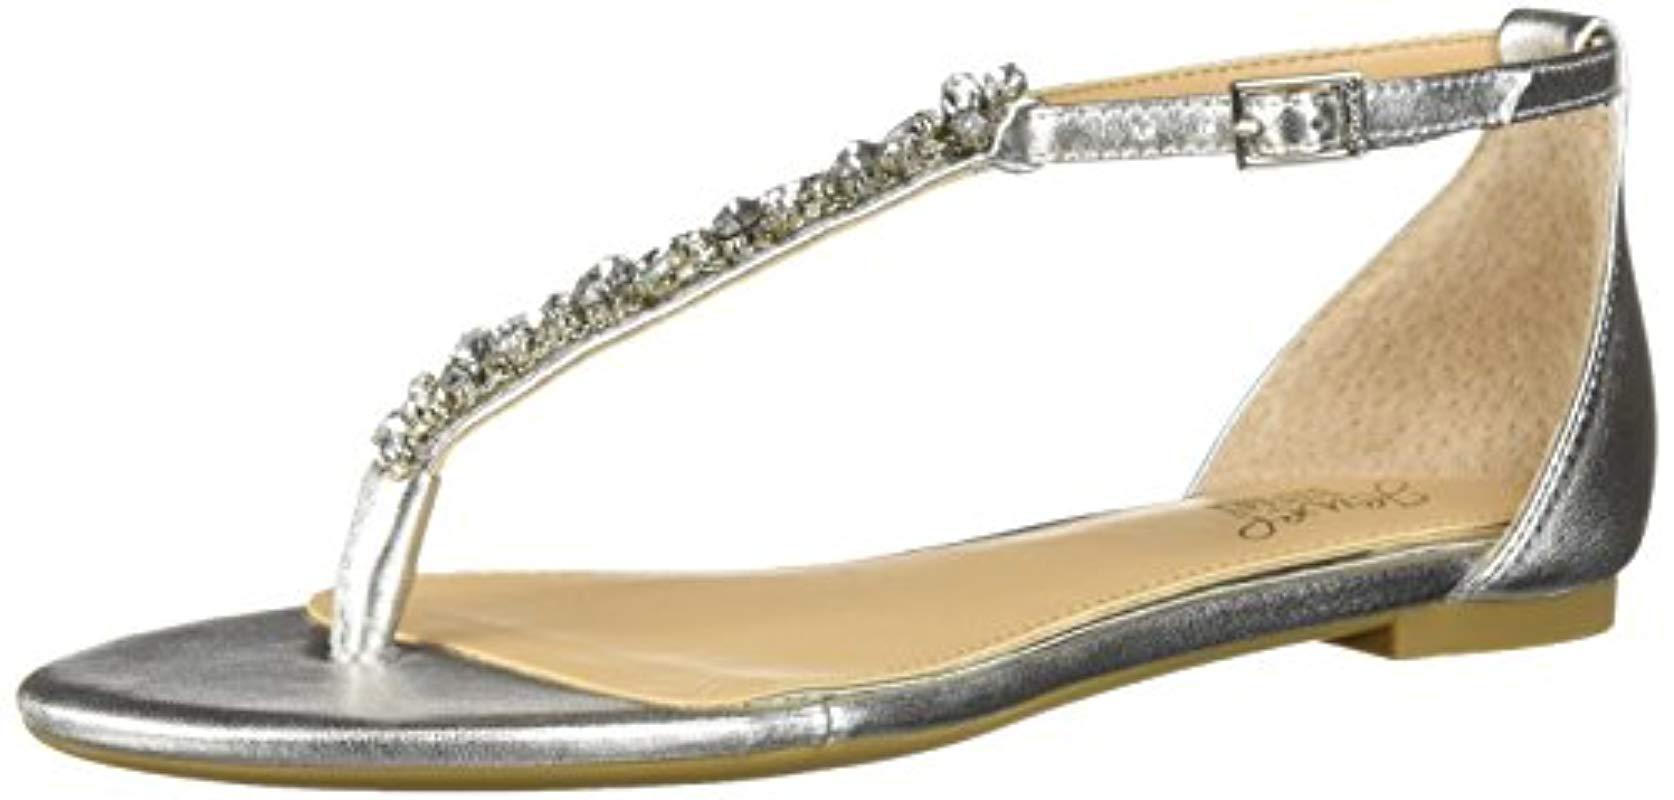 5617e8e74cc Lyst - Badgley Mischka Carrol Ii Sandal in Metallic